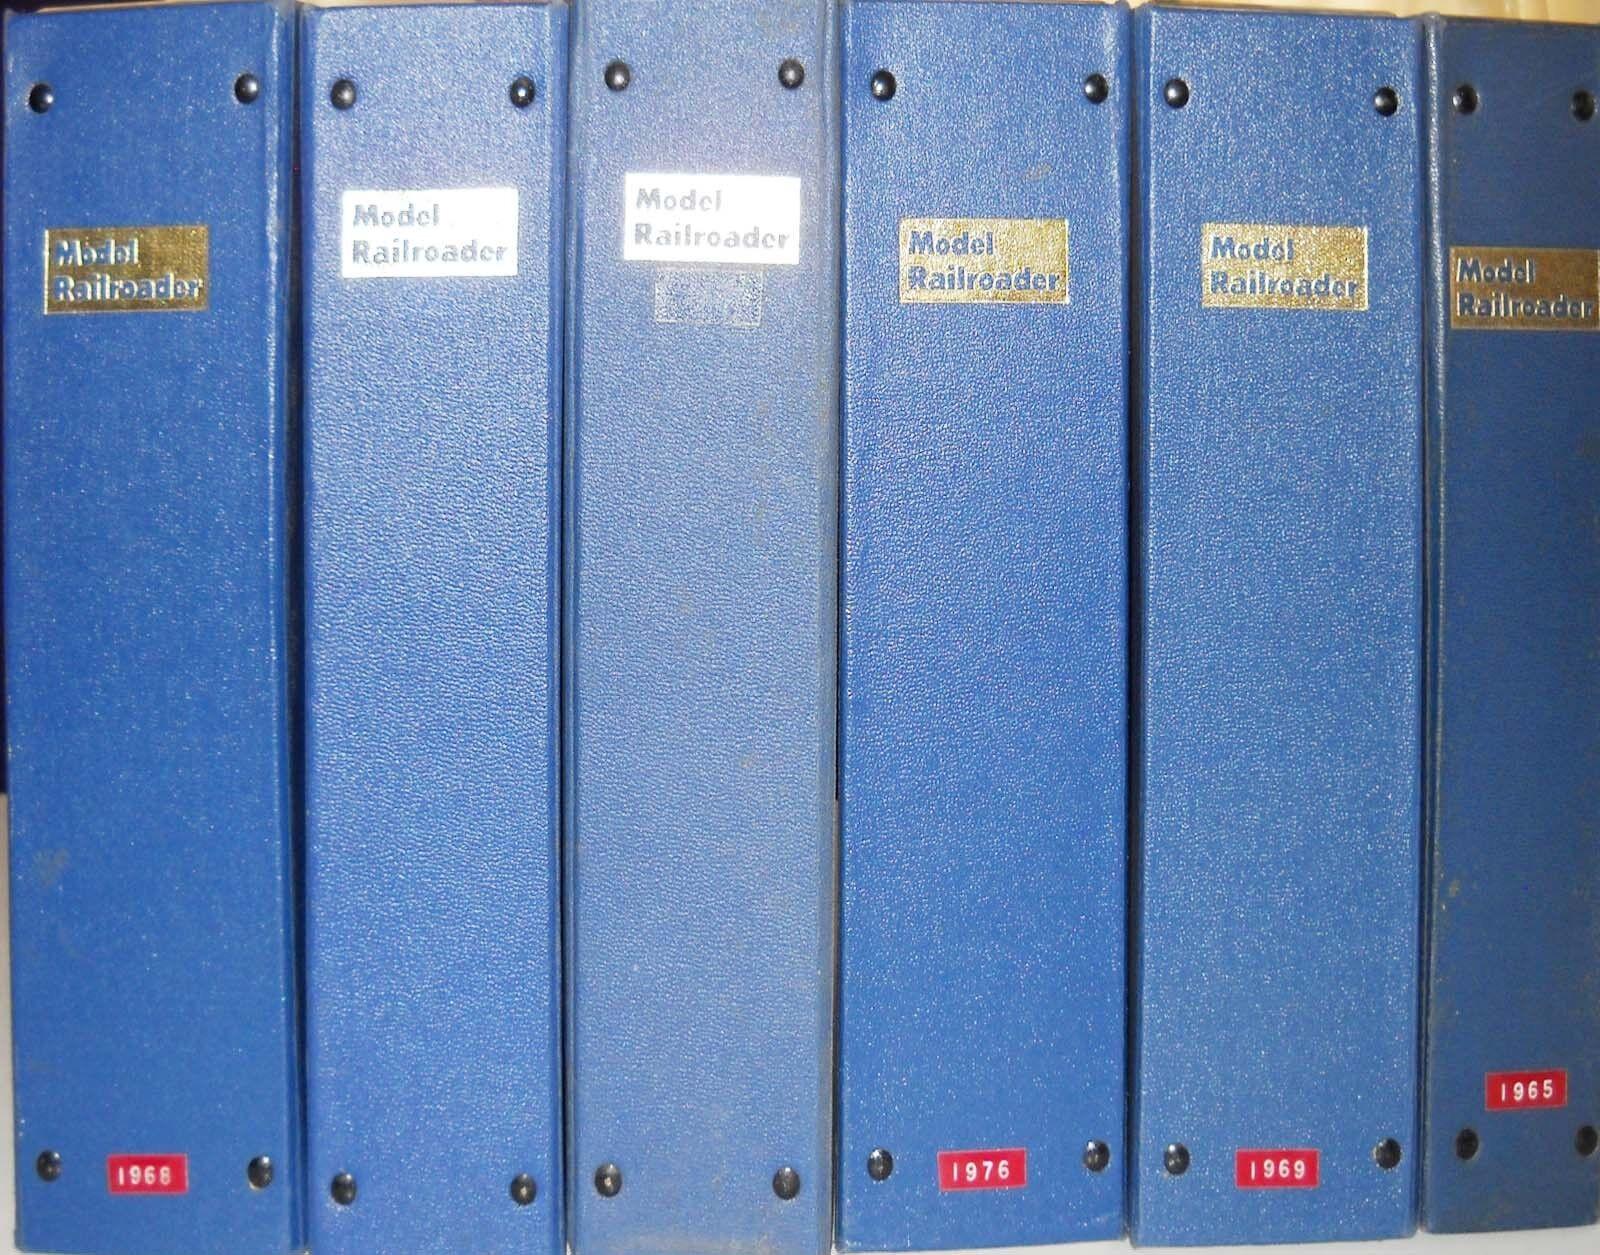 6071_MODEL RAILROADER MAGAZINE BINDERS COVERS